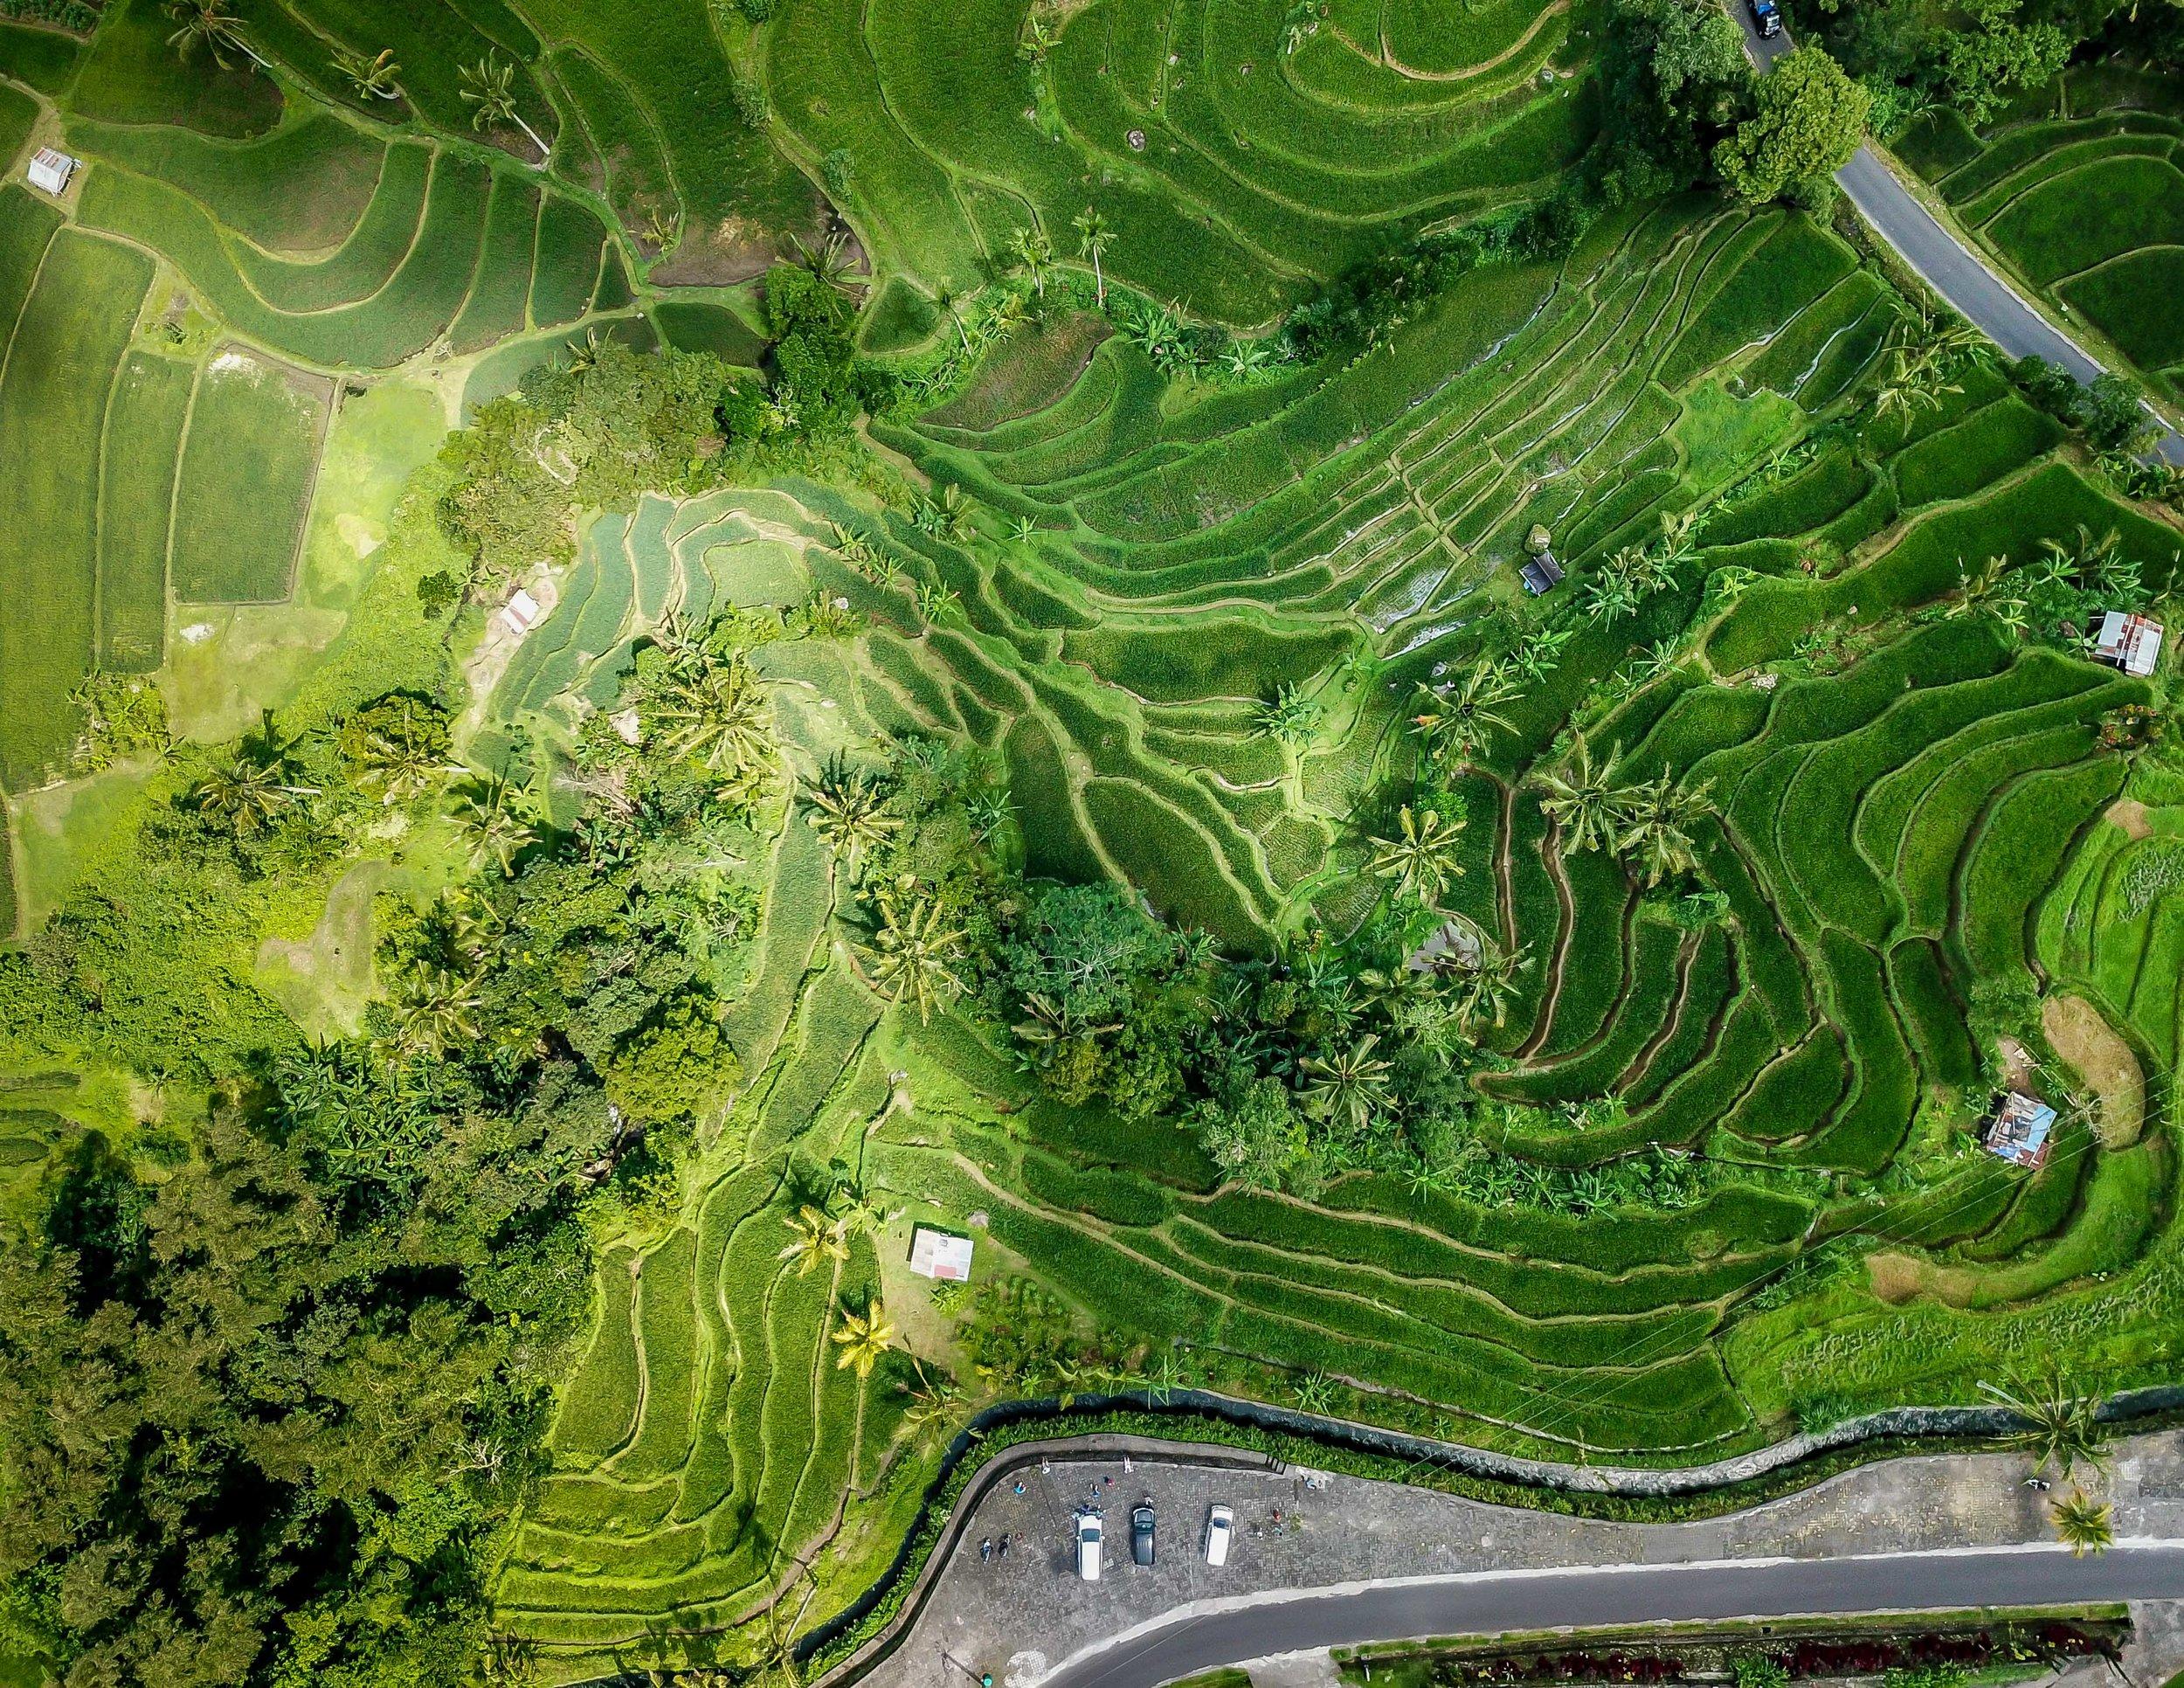 The rice terraces at Jatiluwih in Bali.